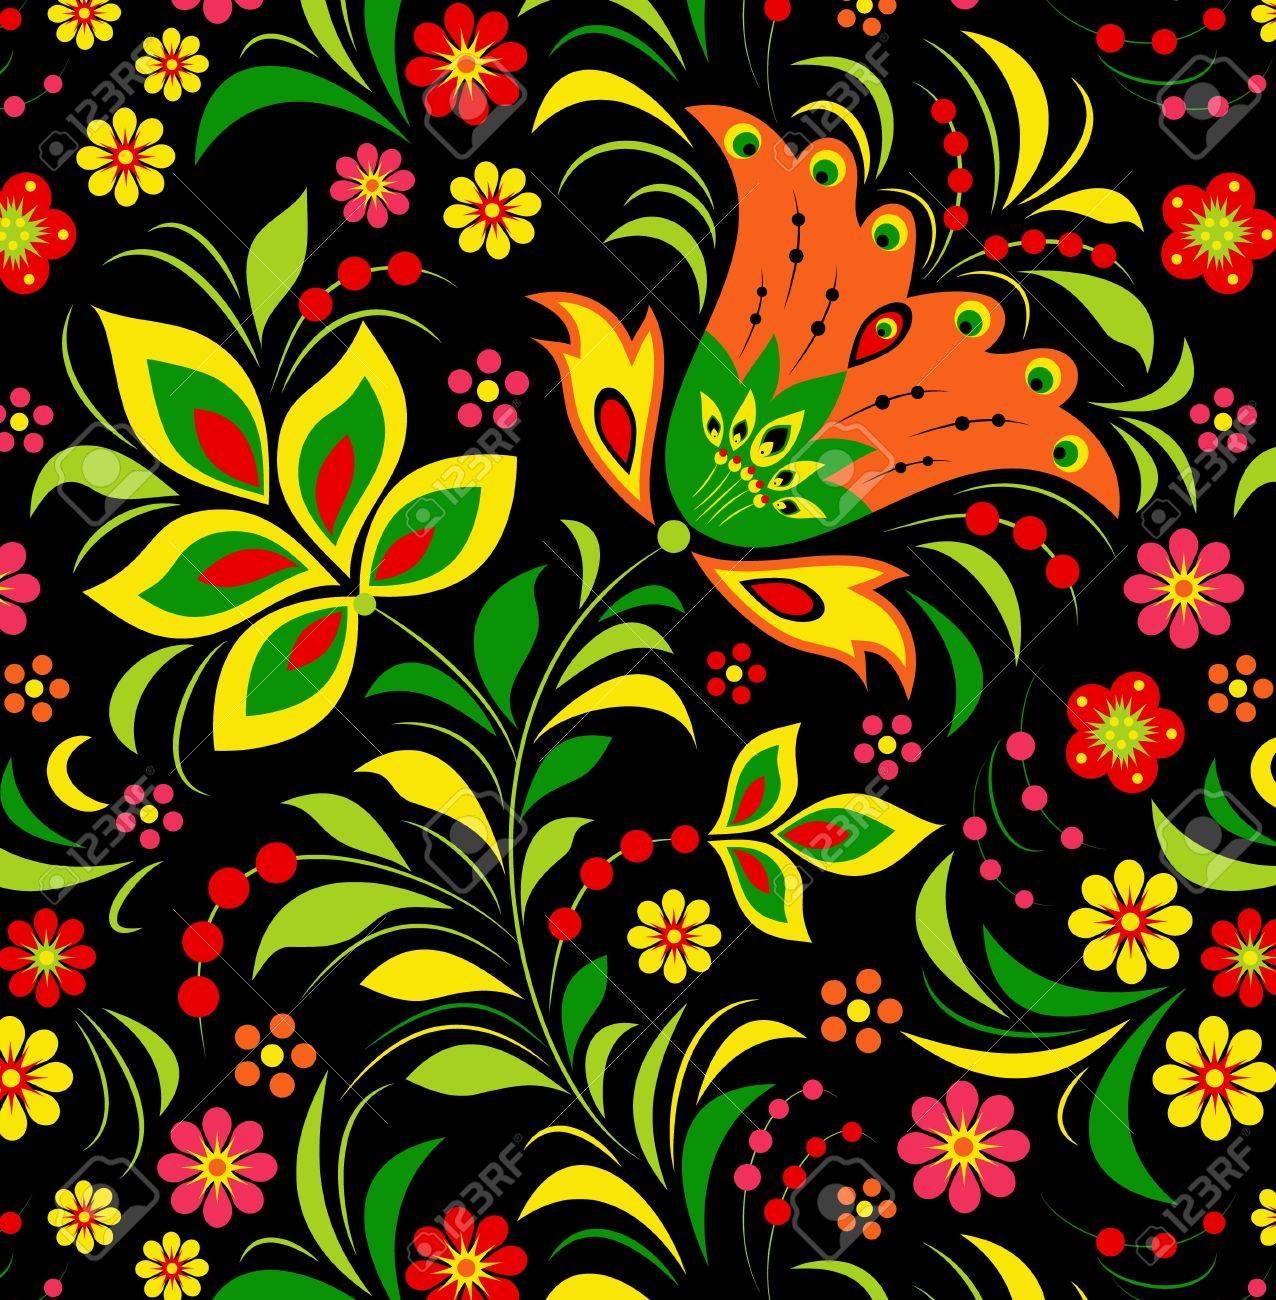 Illustration of  colorful flower on black background. Stock Vector - 12077551